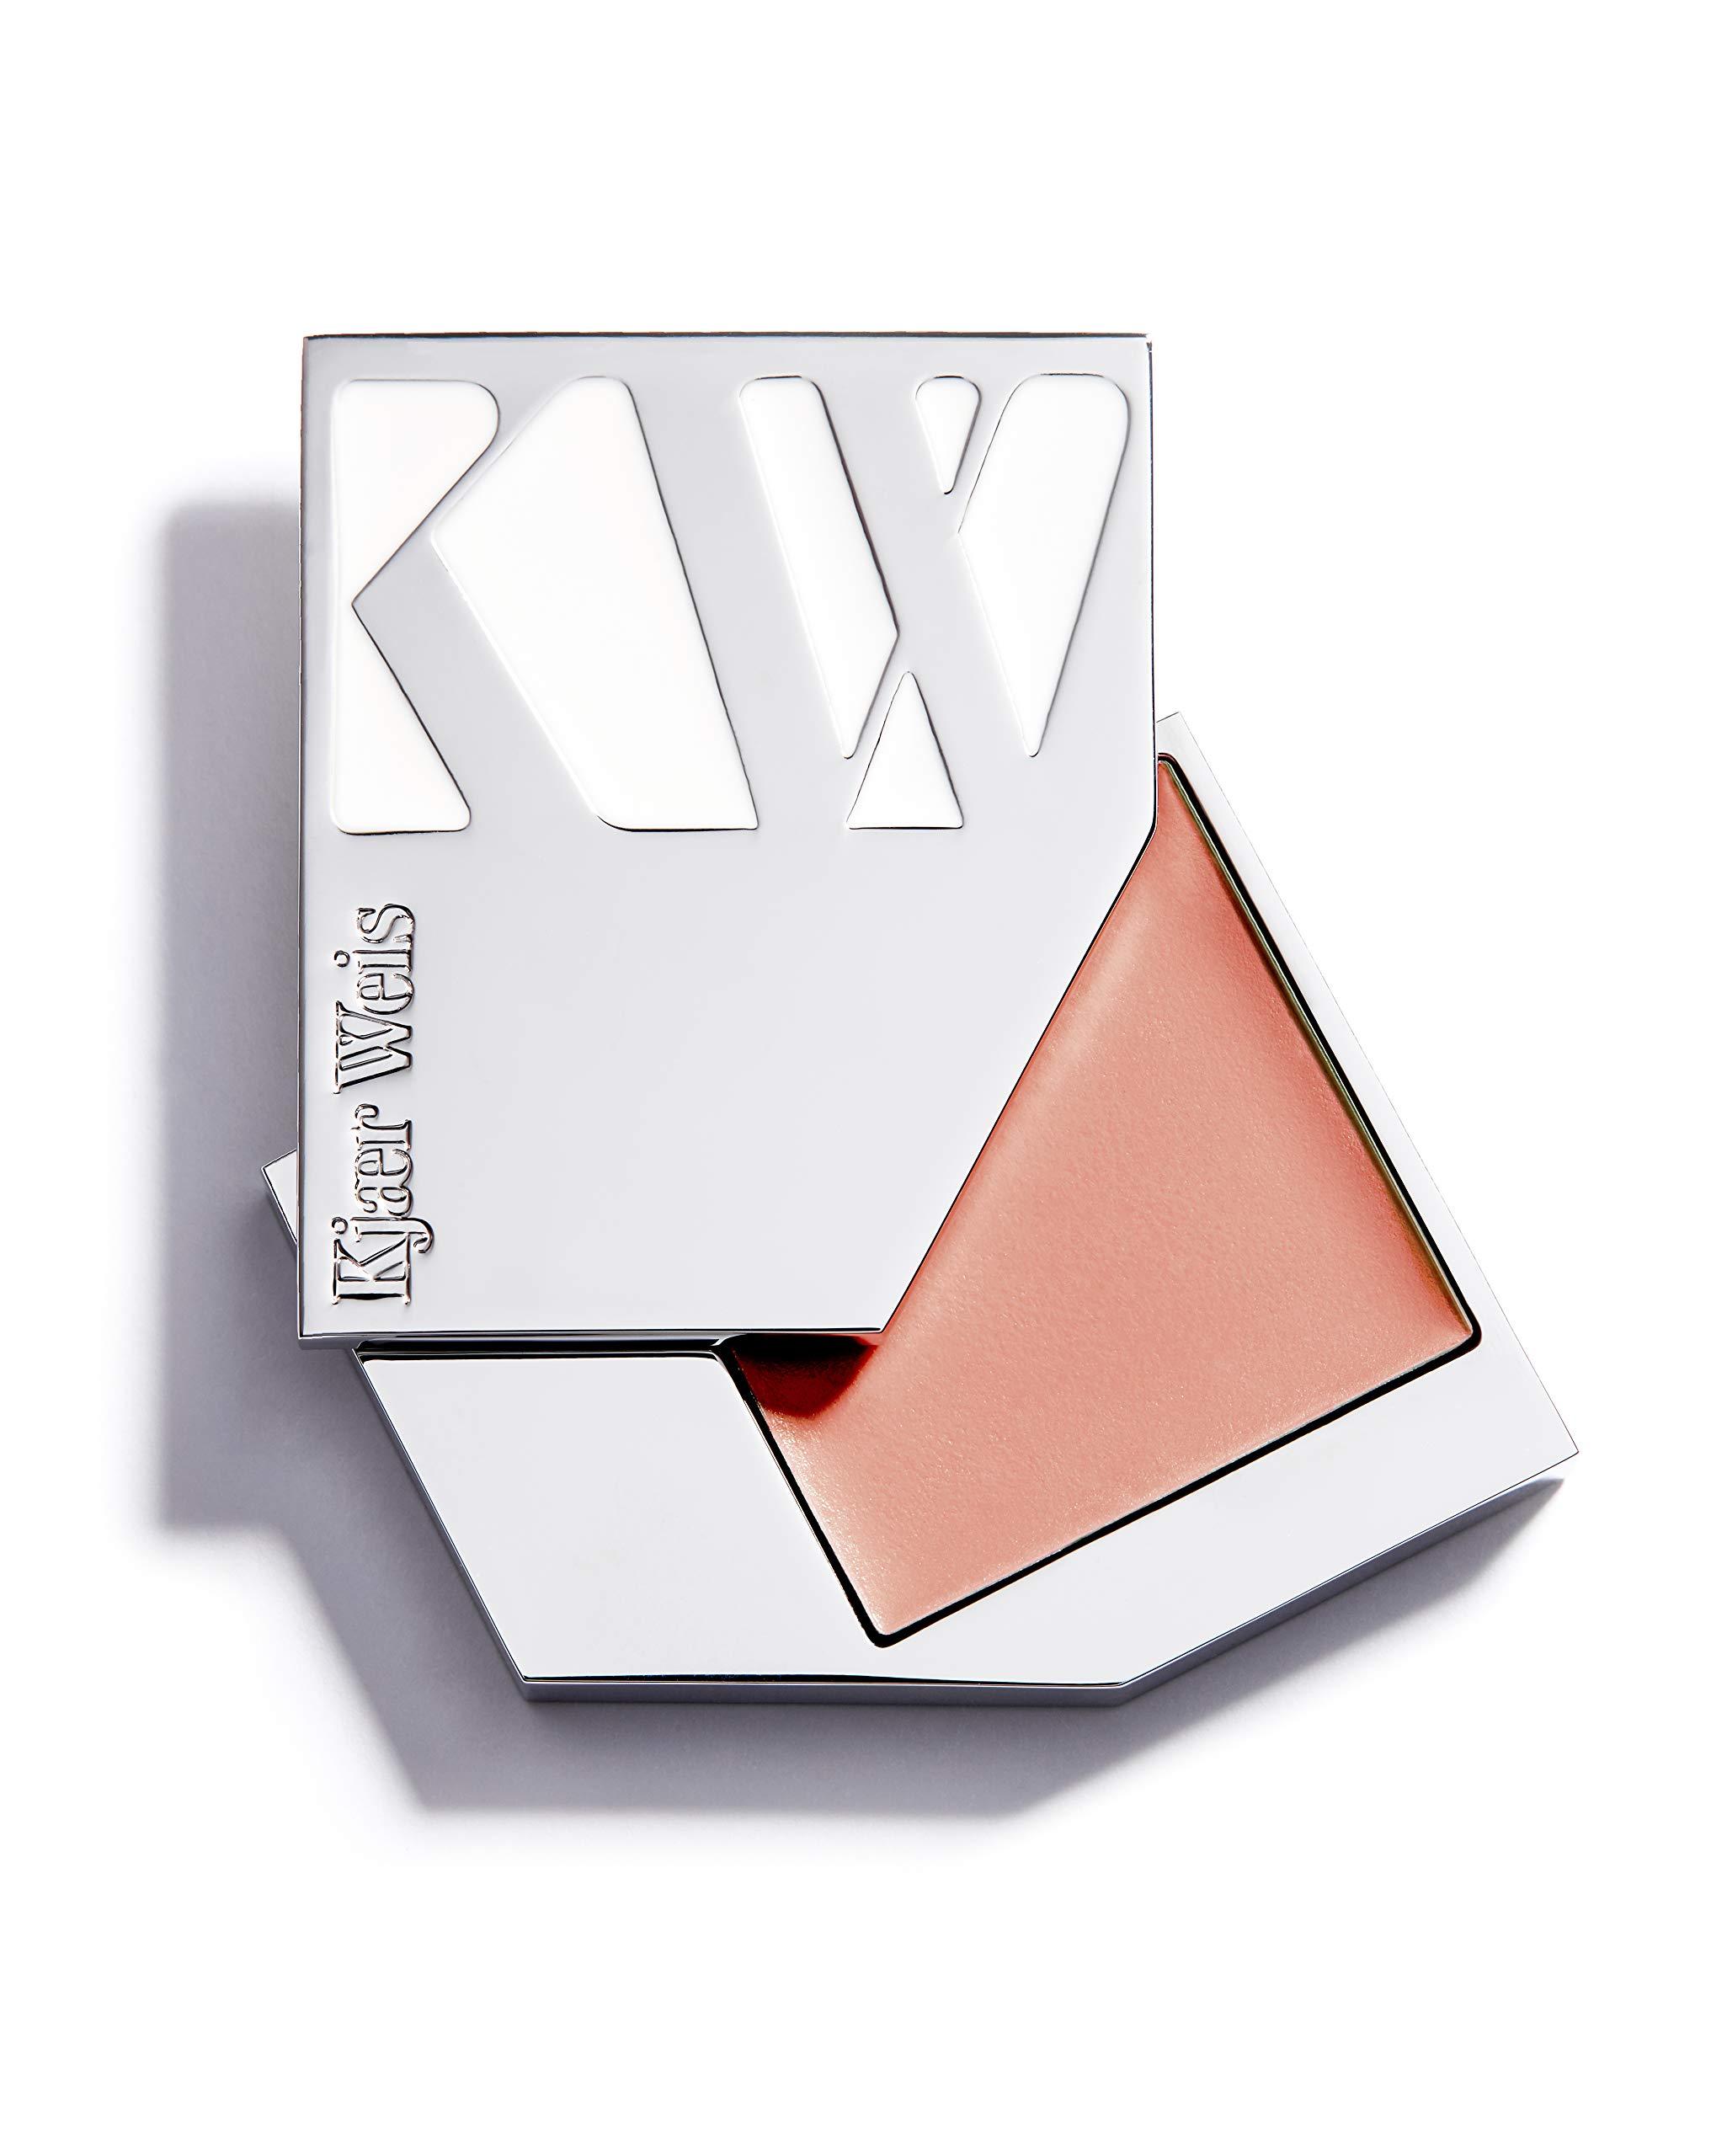 Kjaer Weis Cream Blush, Precious, 0.29 Pound